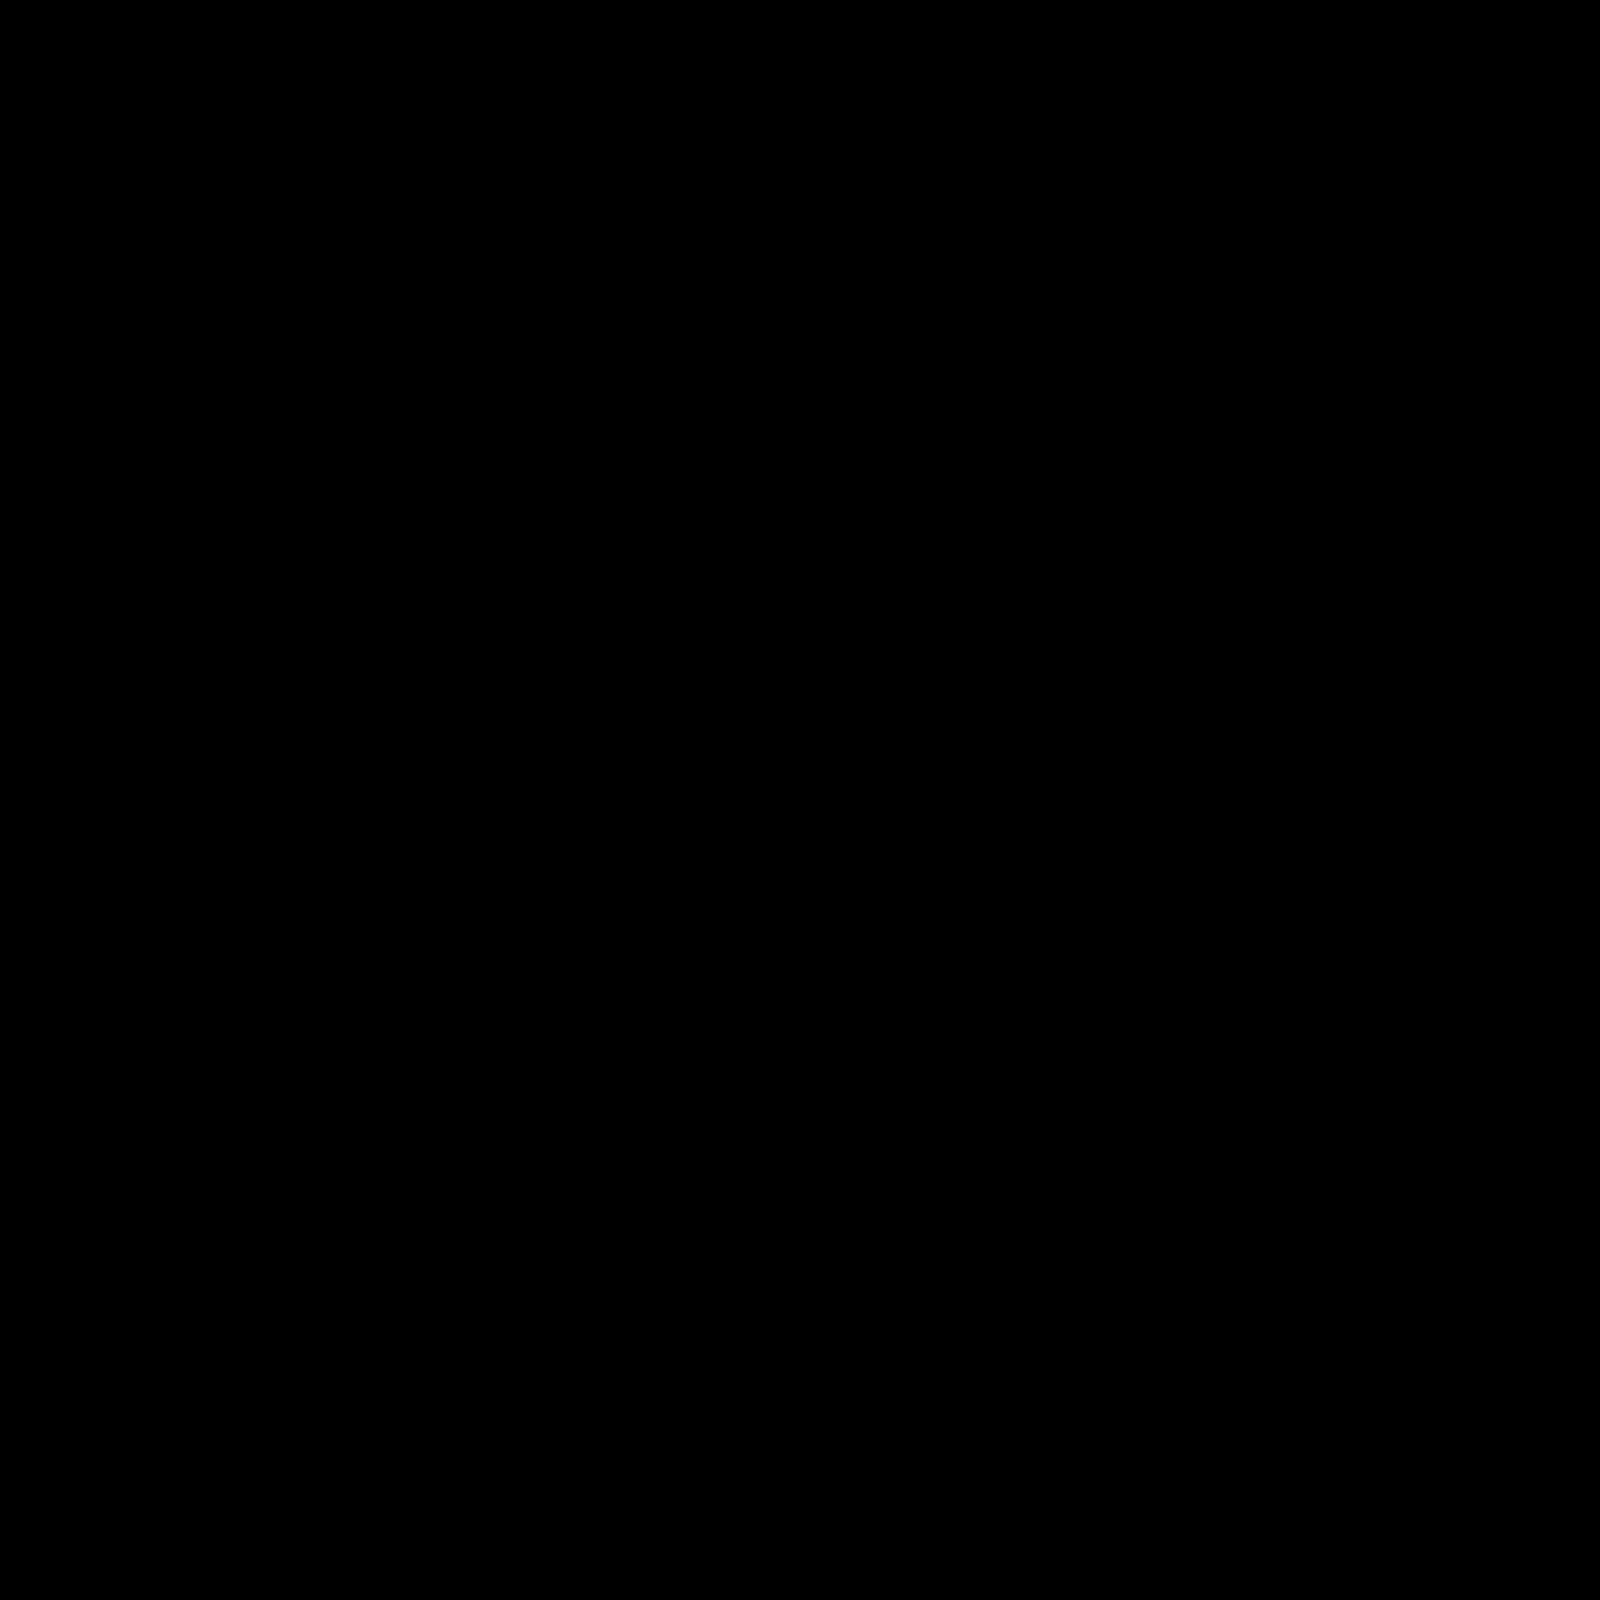 Боковое меню icon